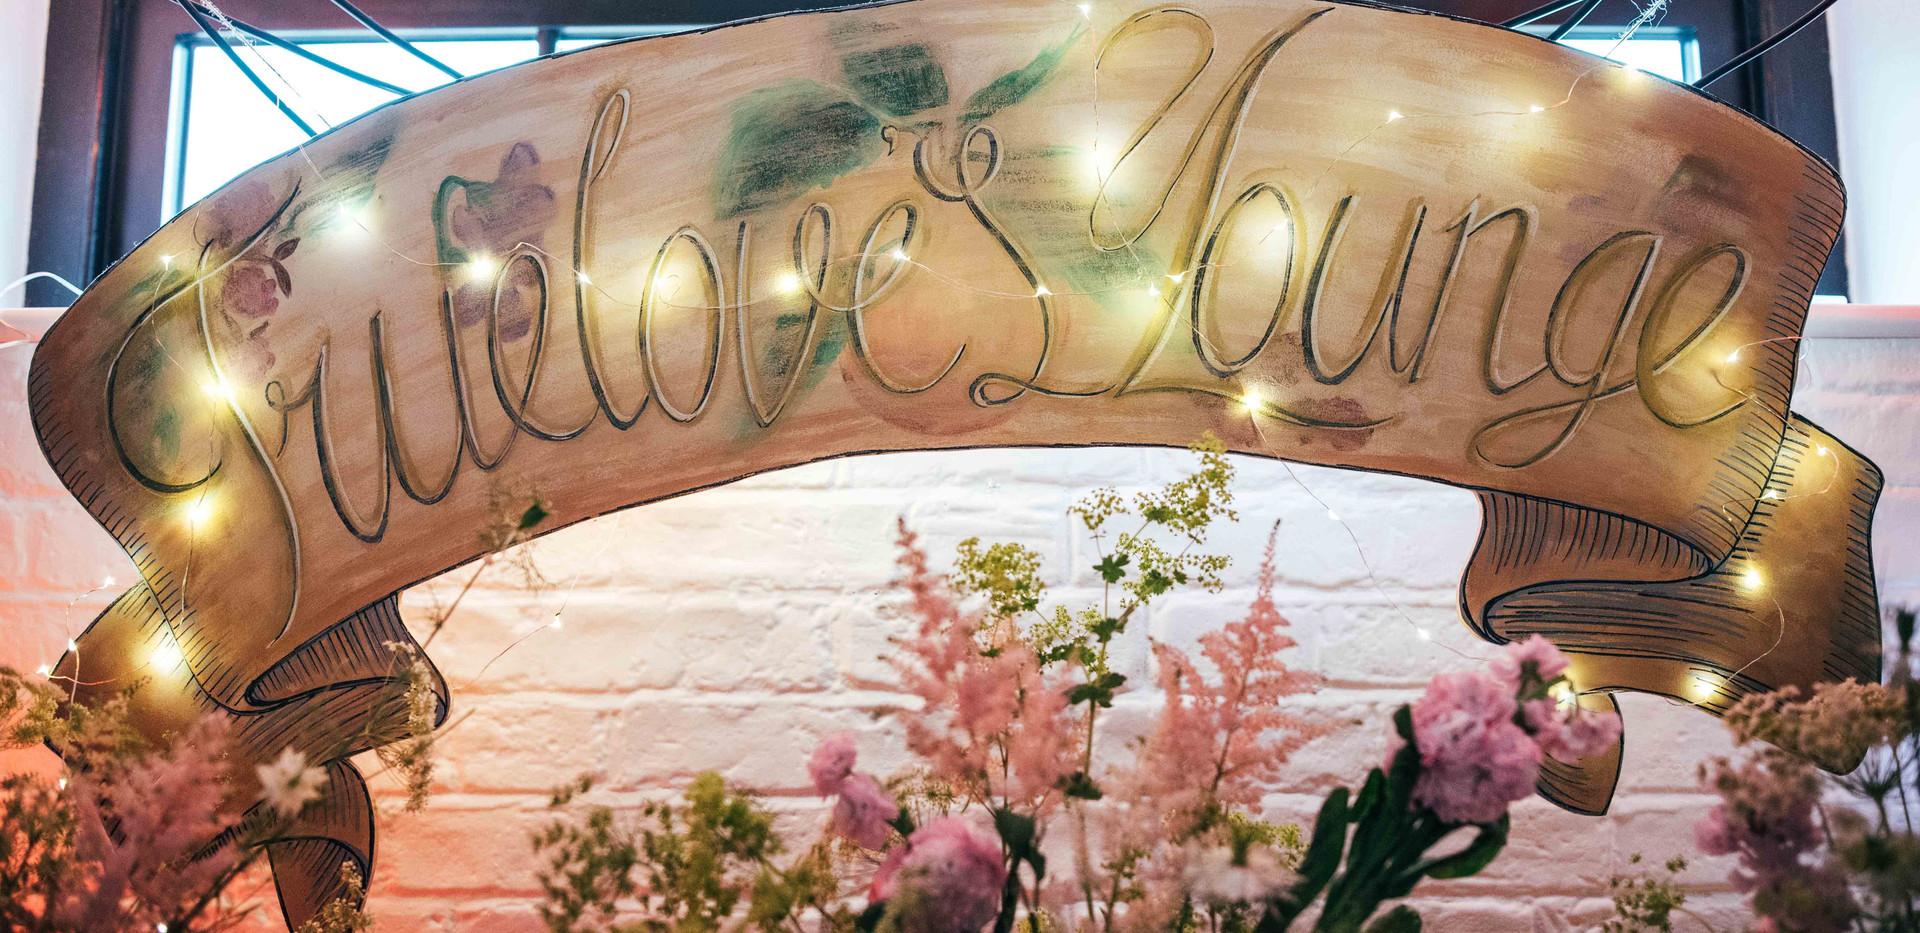 Truelove's Lounge sign sml.jpg